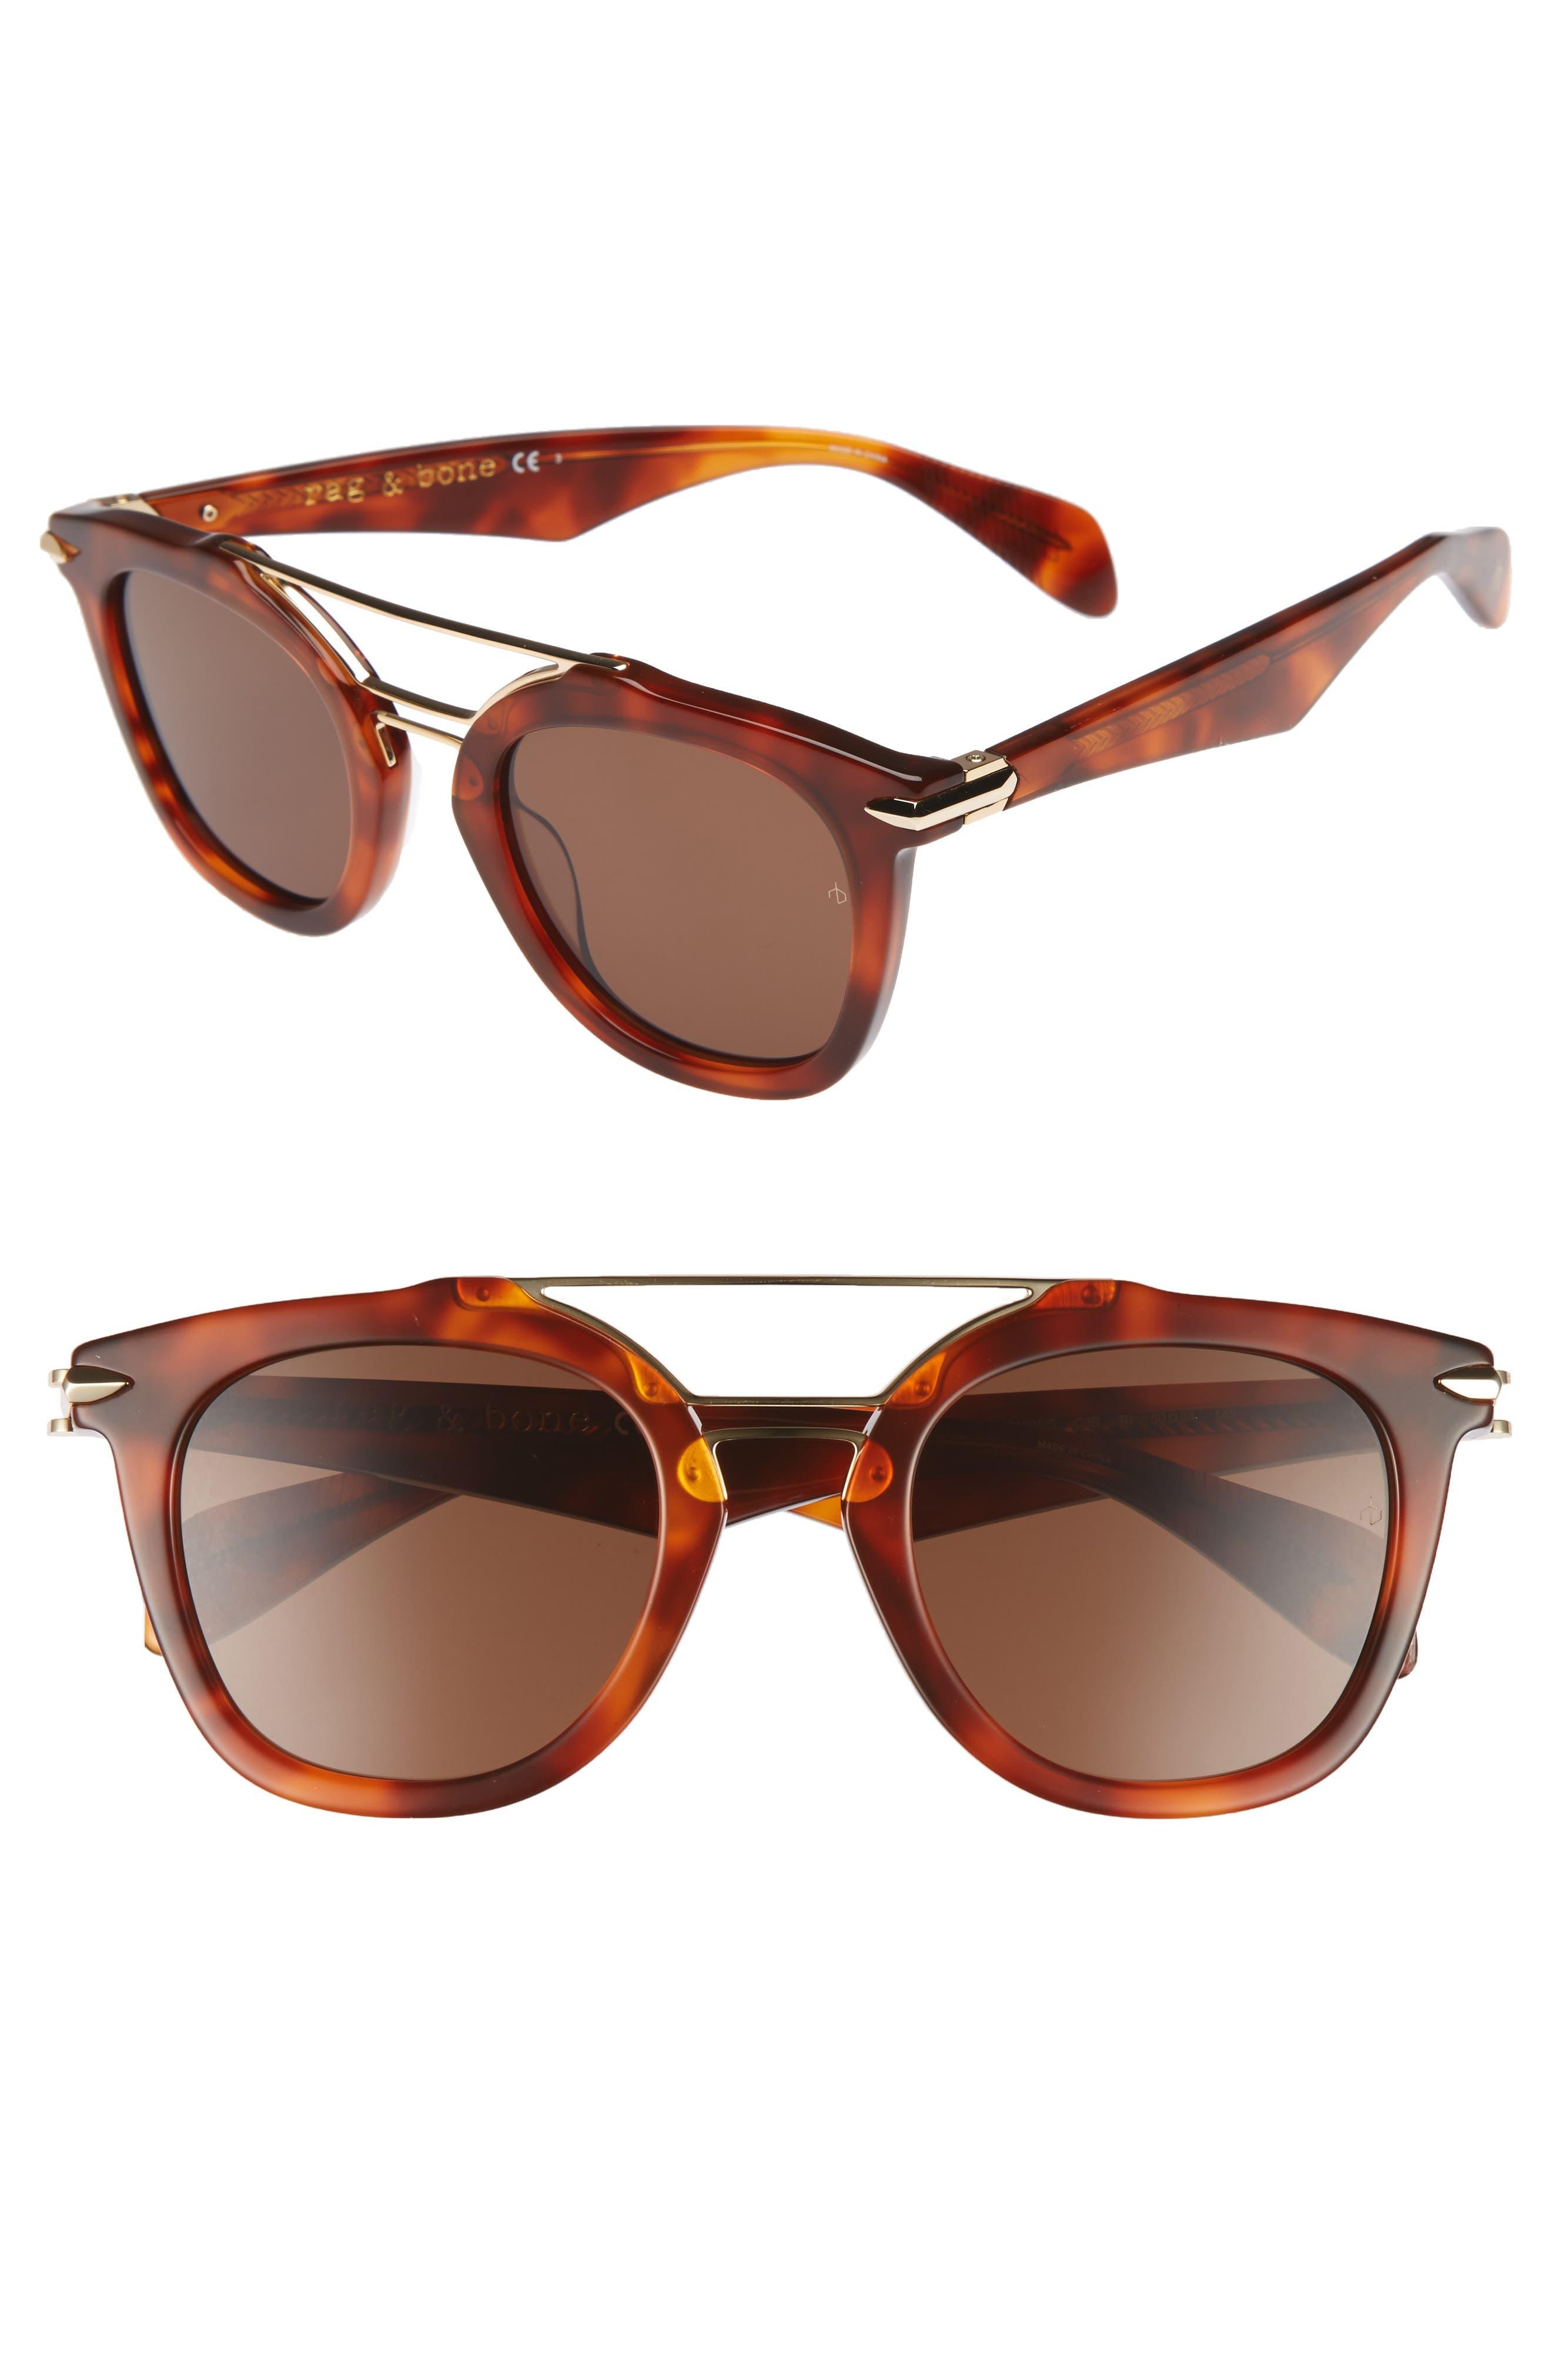 50mm Round Aviator Sunglasses,                         Main,                         color, Havana Honey